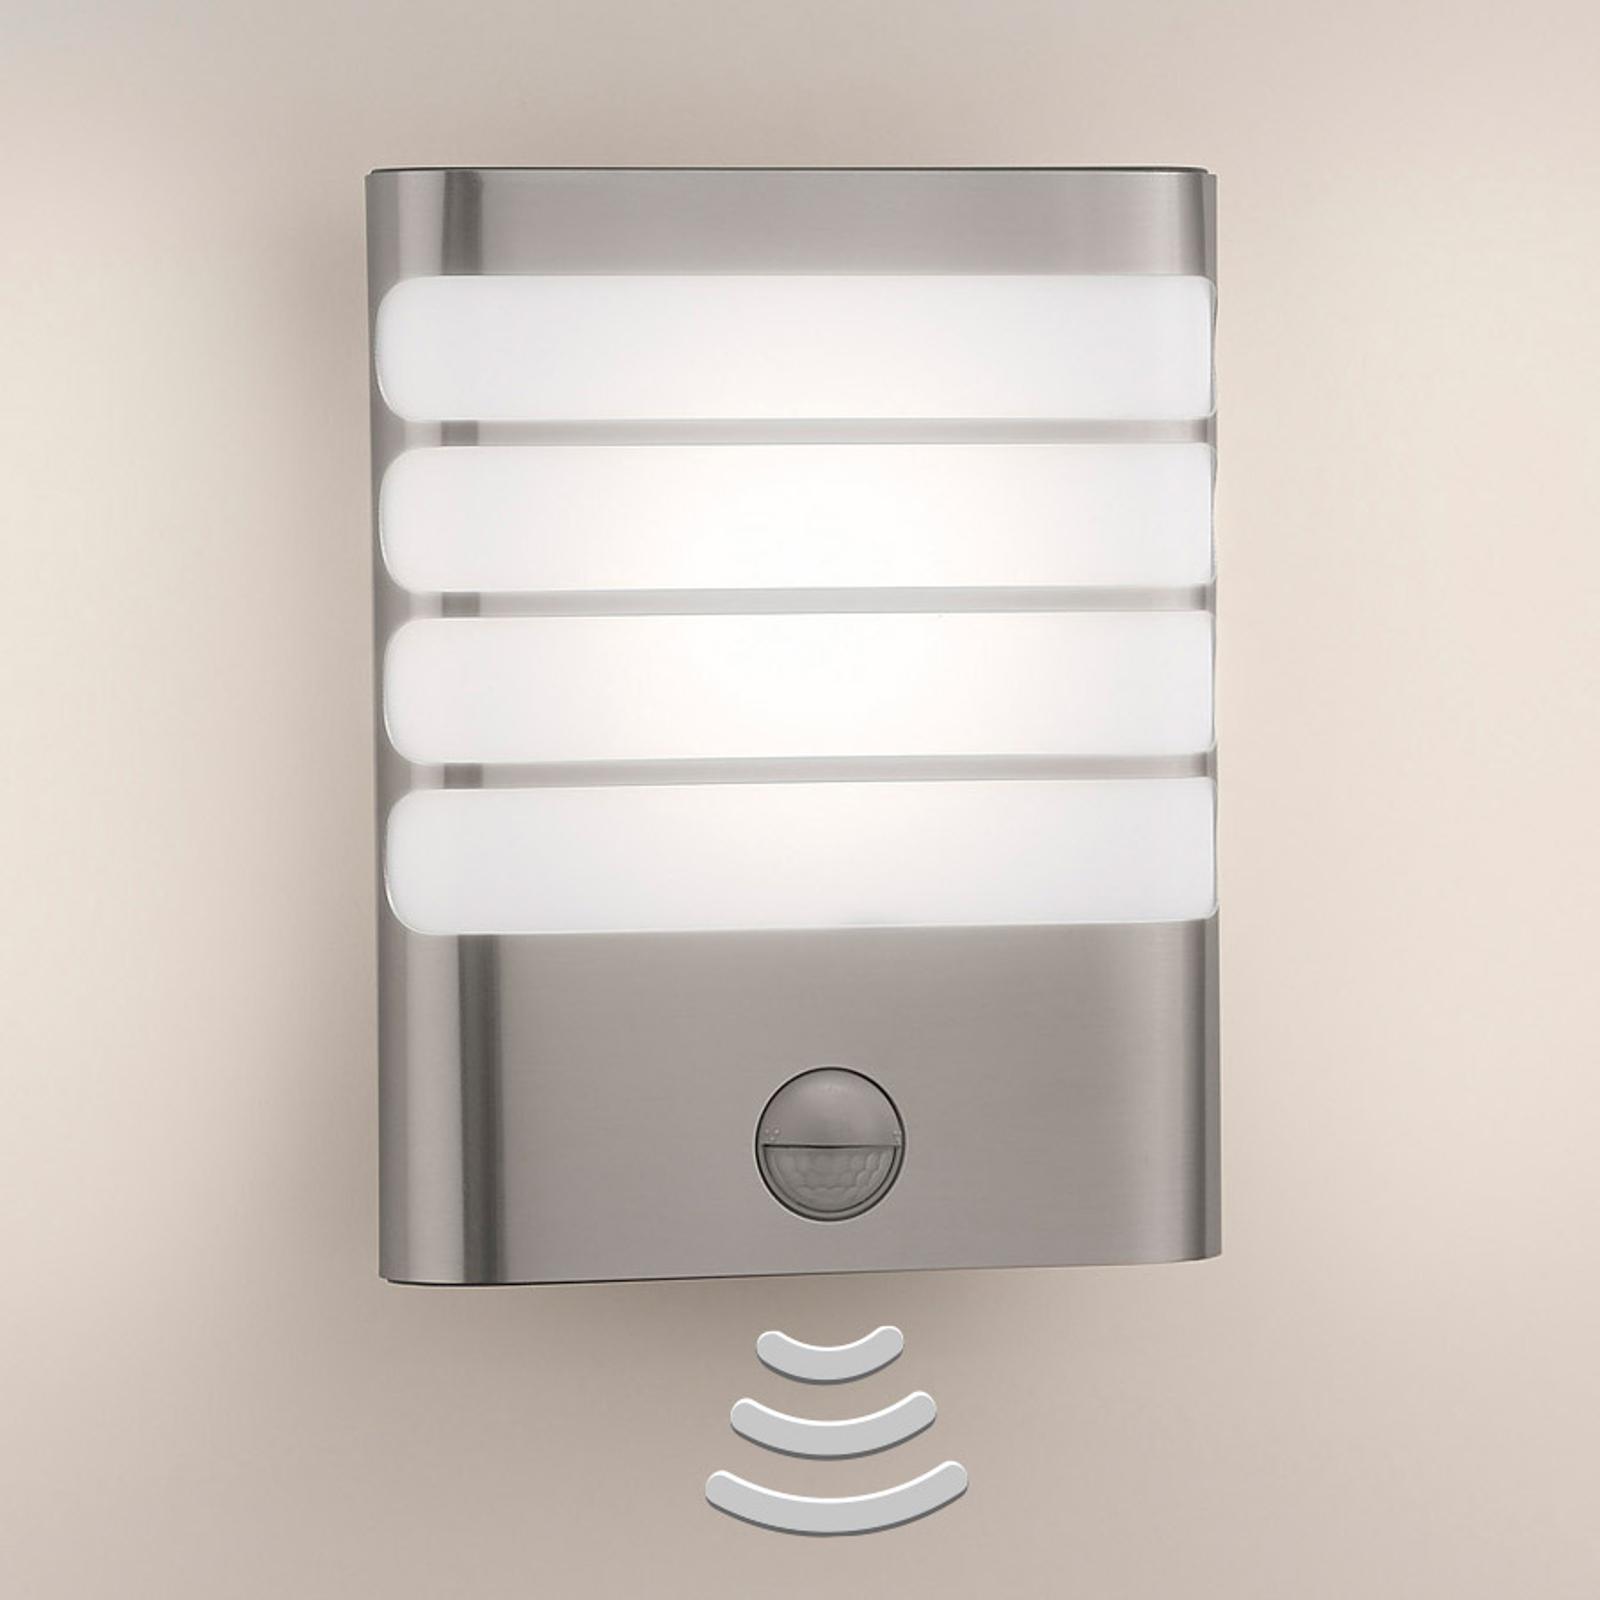 Philips Raccoon LED-væglampe rustfrit stål